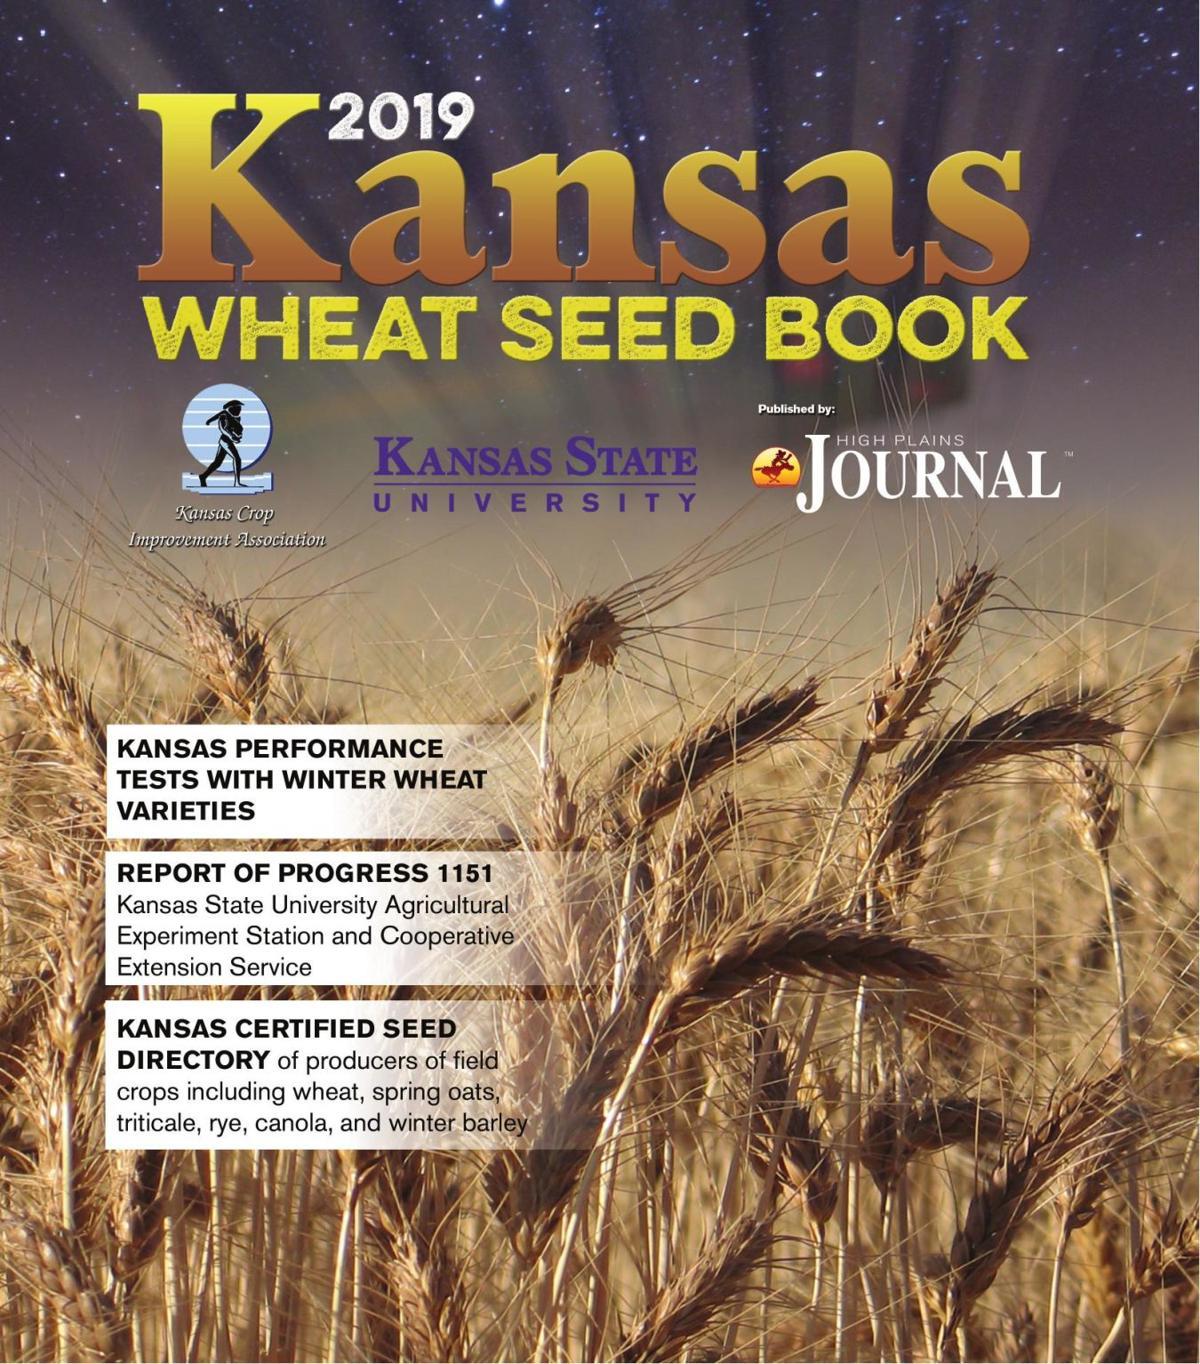 2019 Kansas Wheat